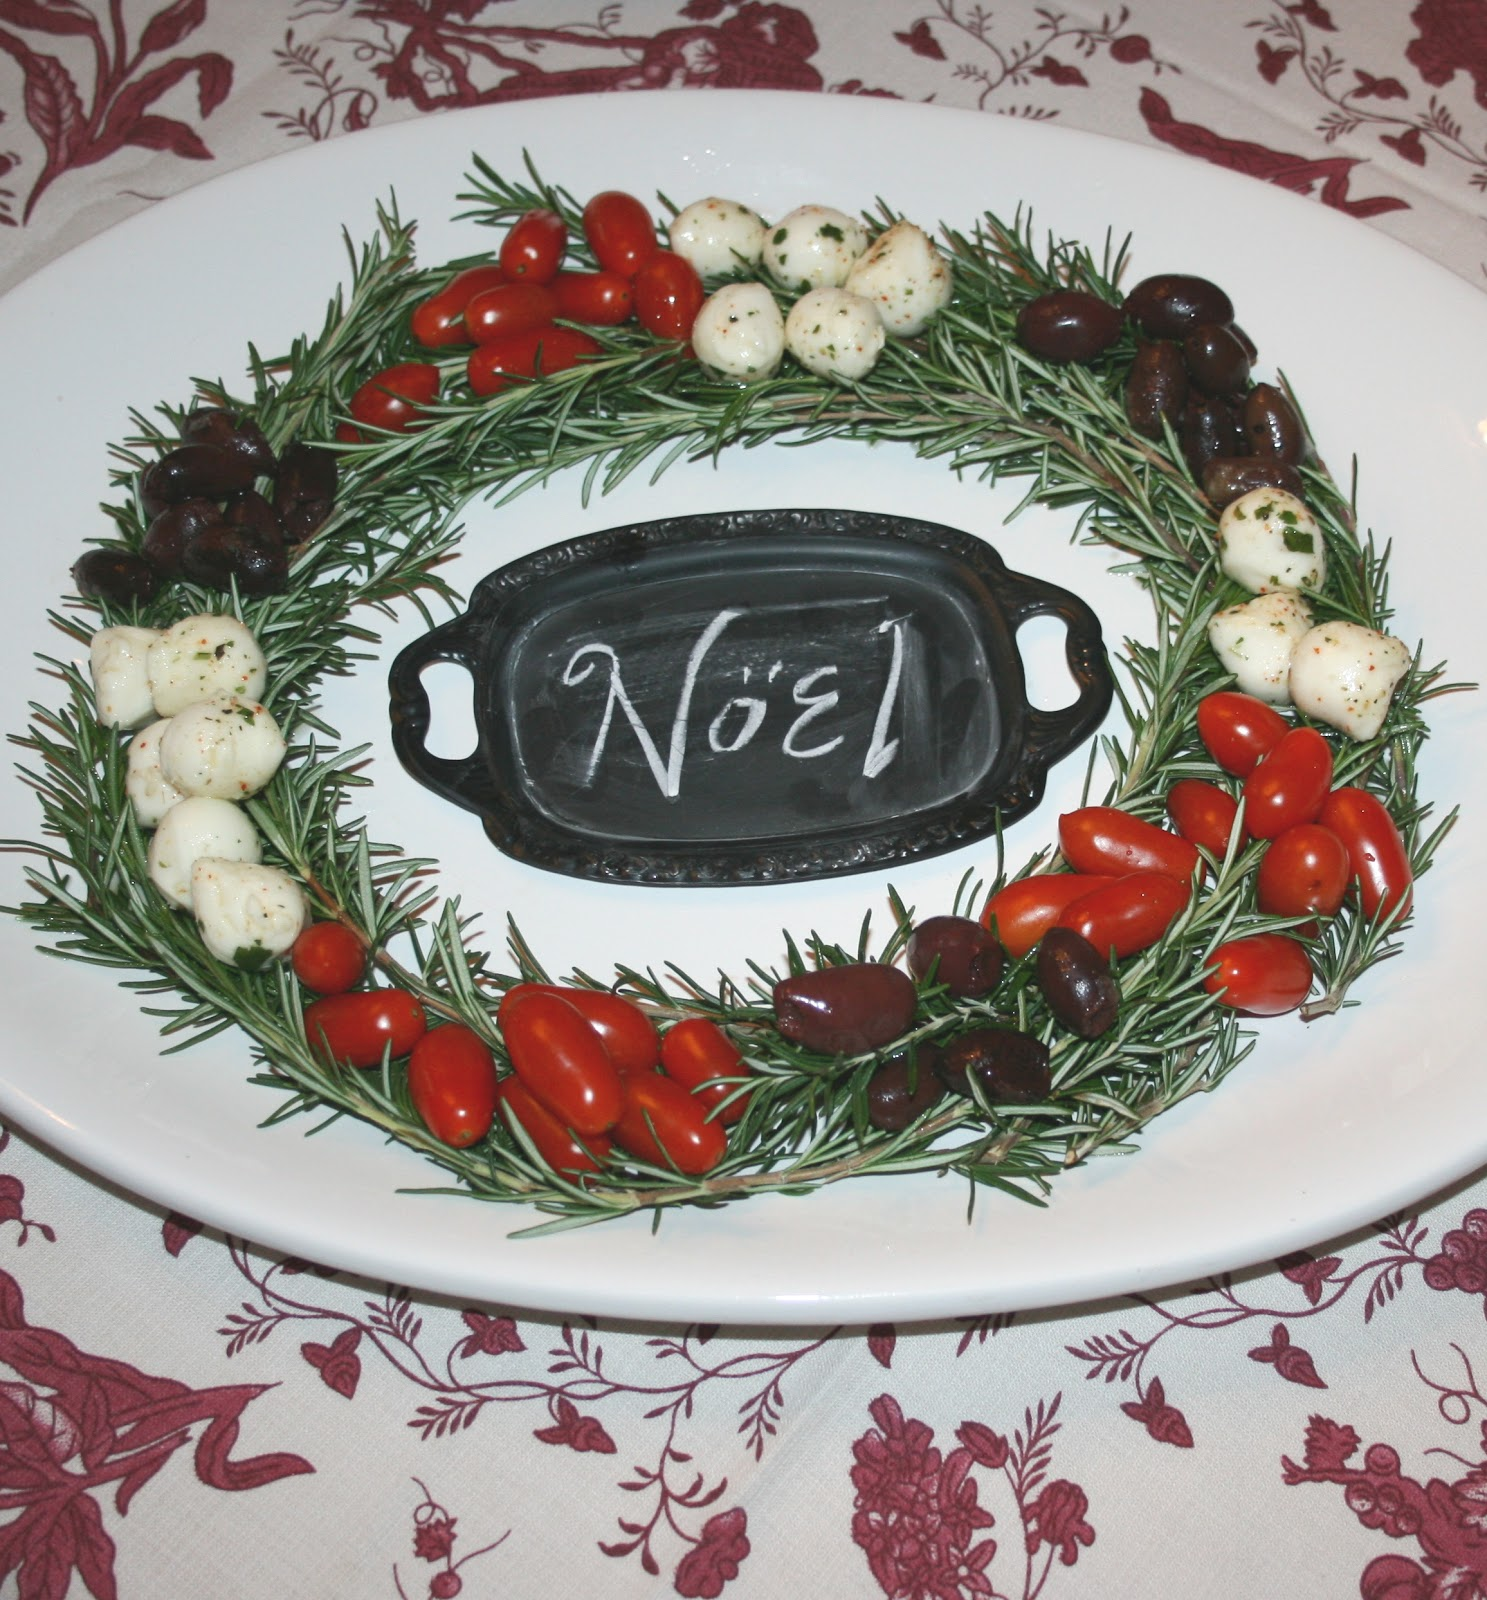 Ciao! Newport Beach: Christmas Appetizer Italian Style